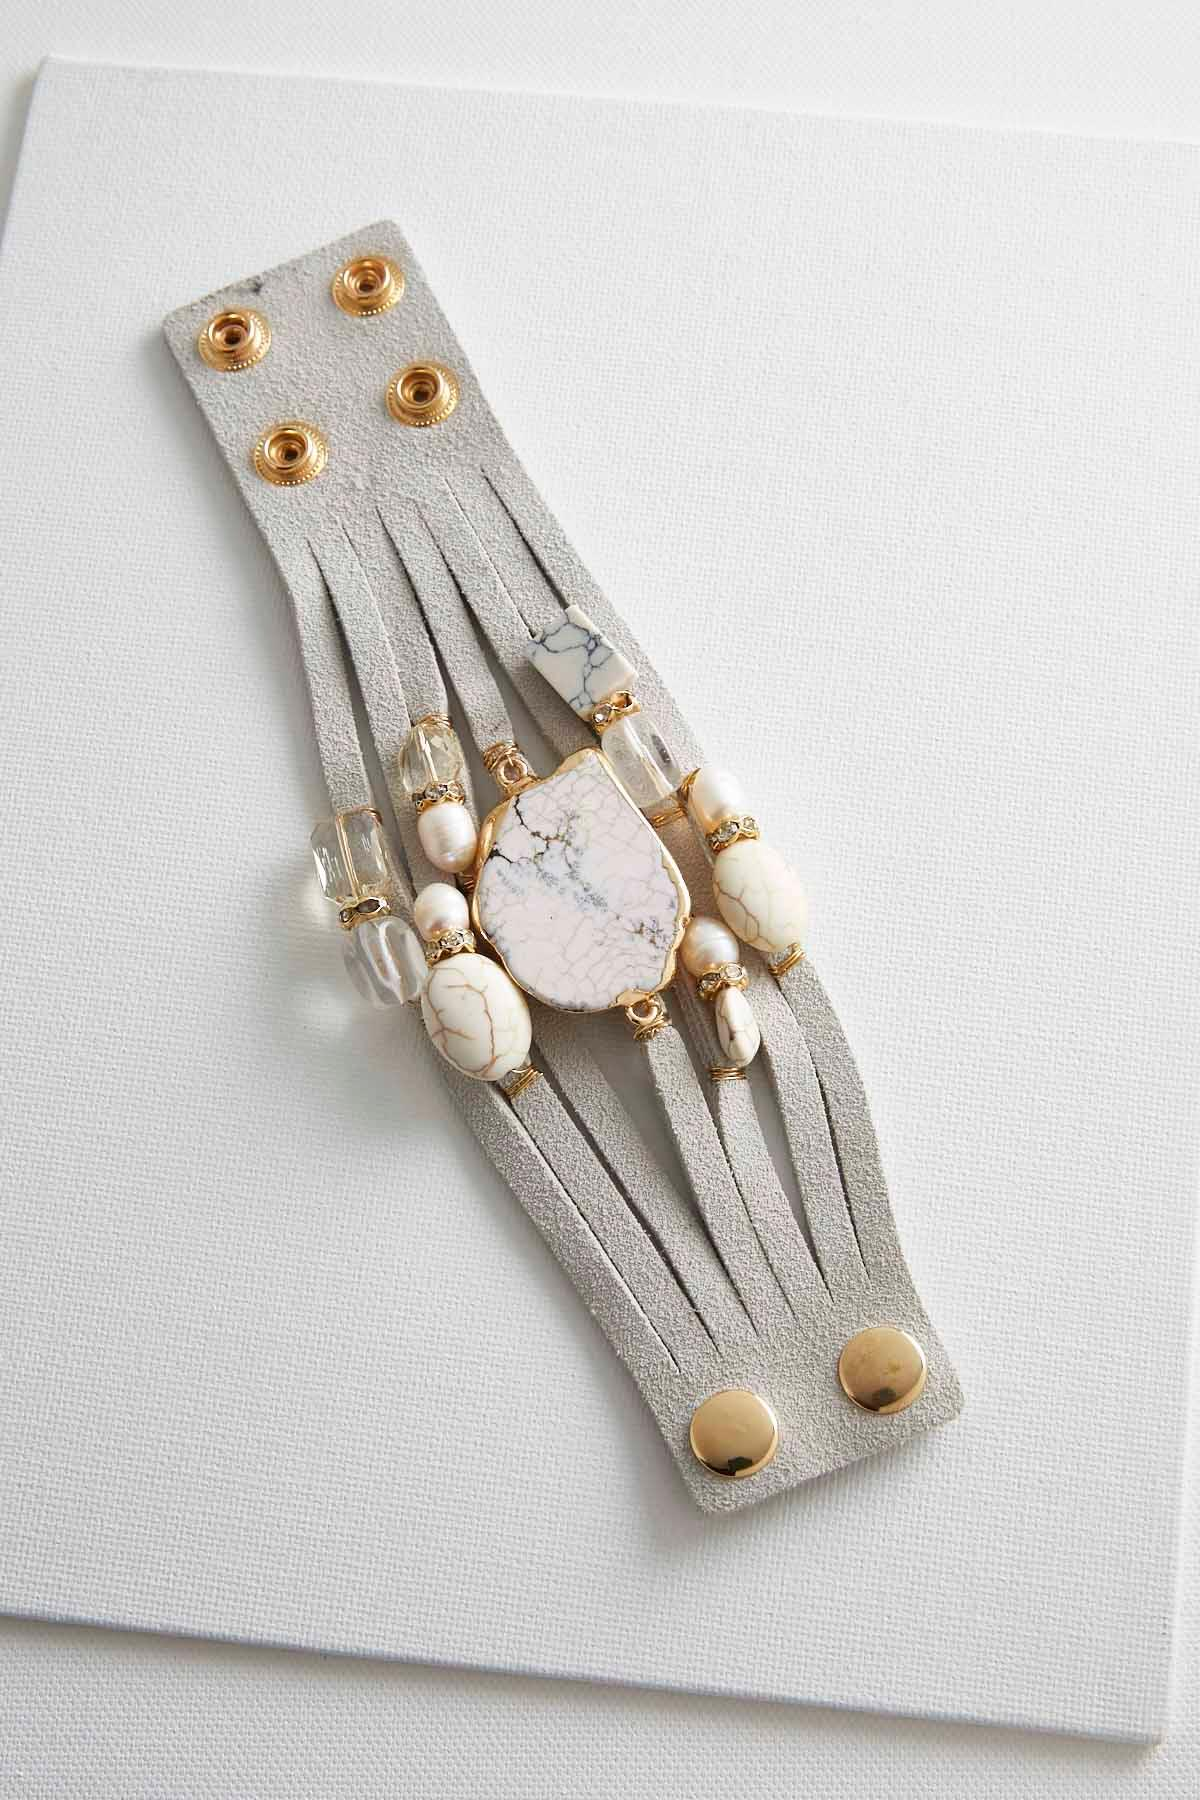 Speckled Semi- Precious Stone Wrap Bracelet